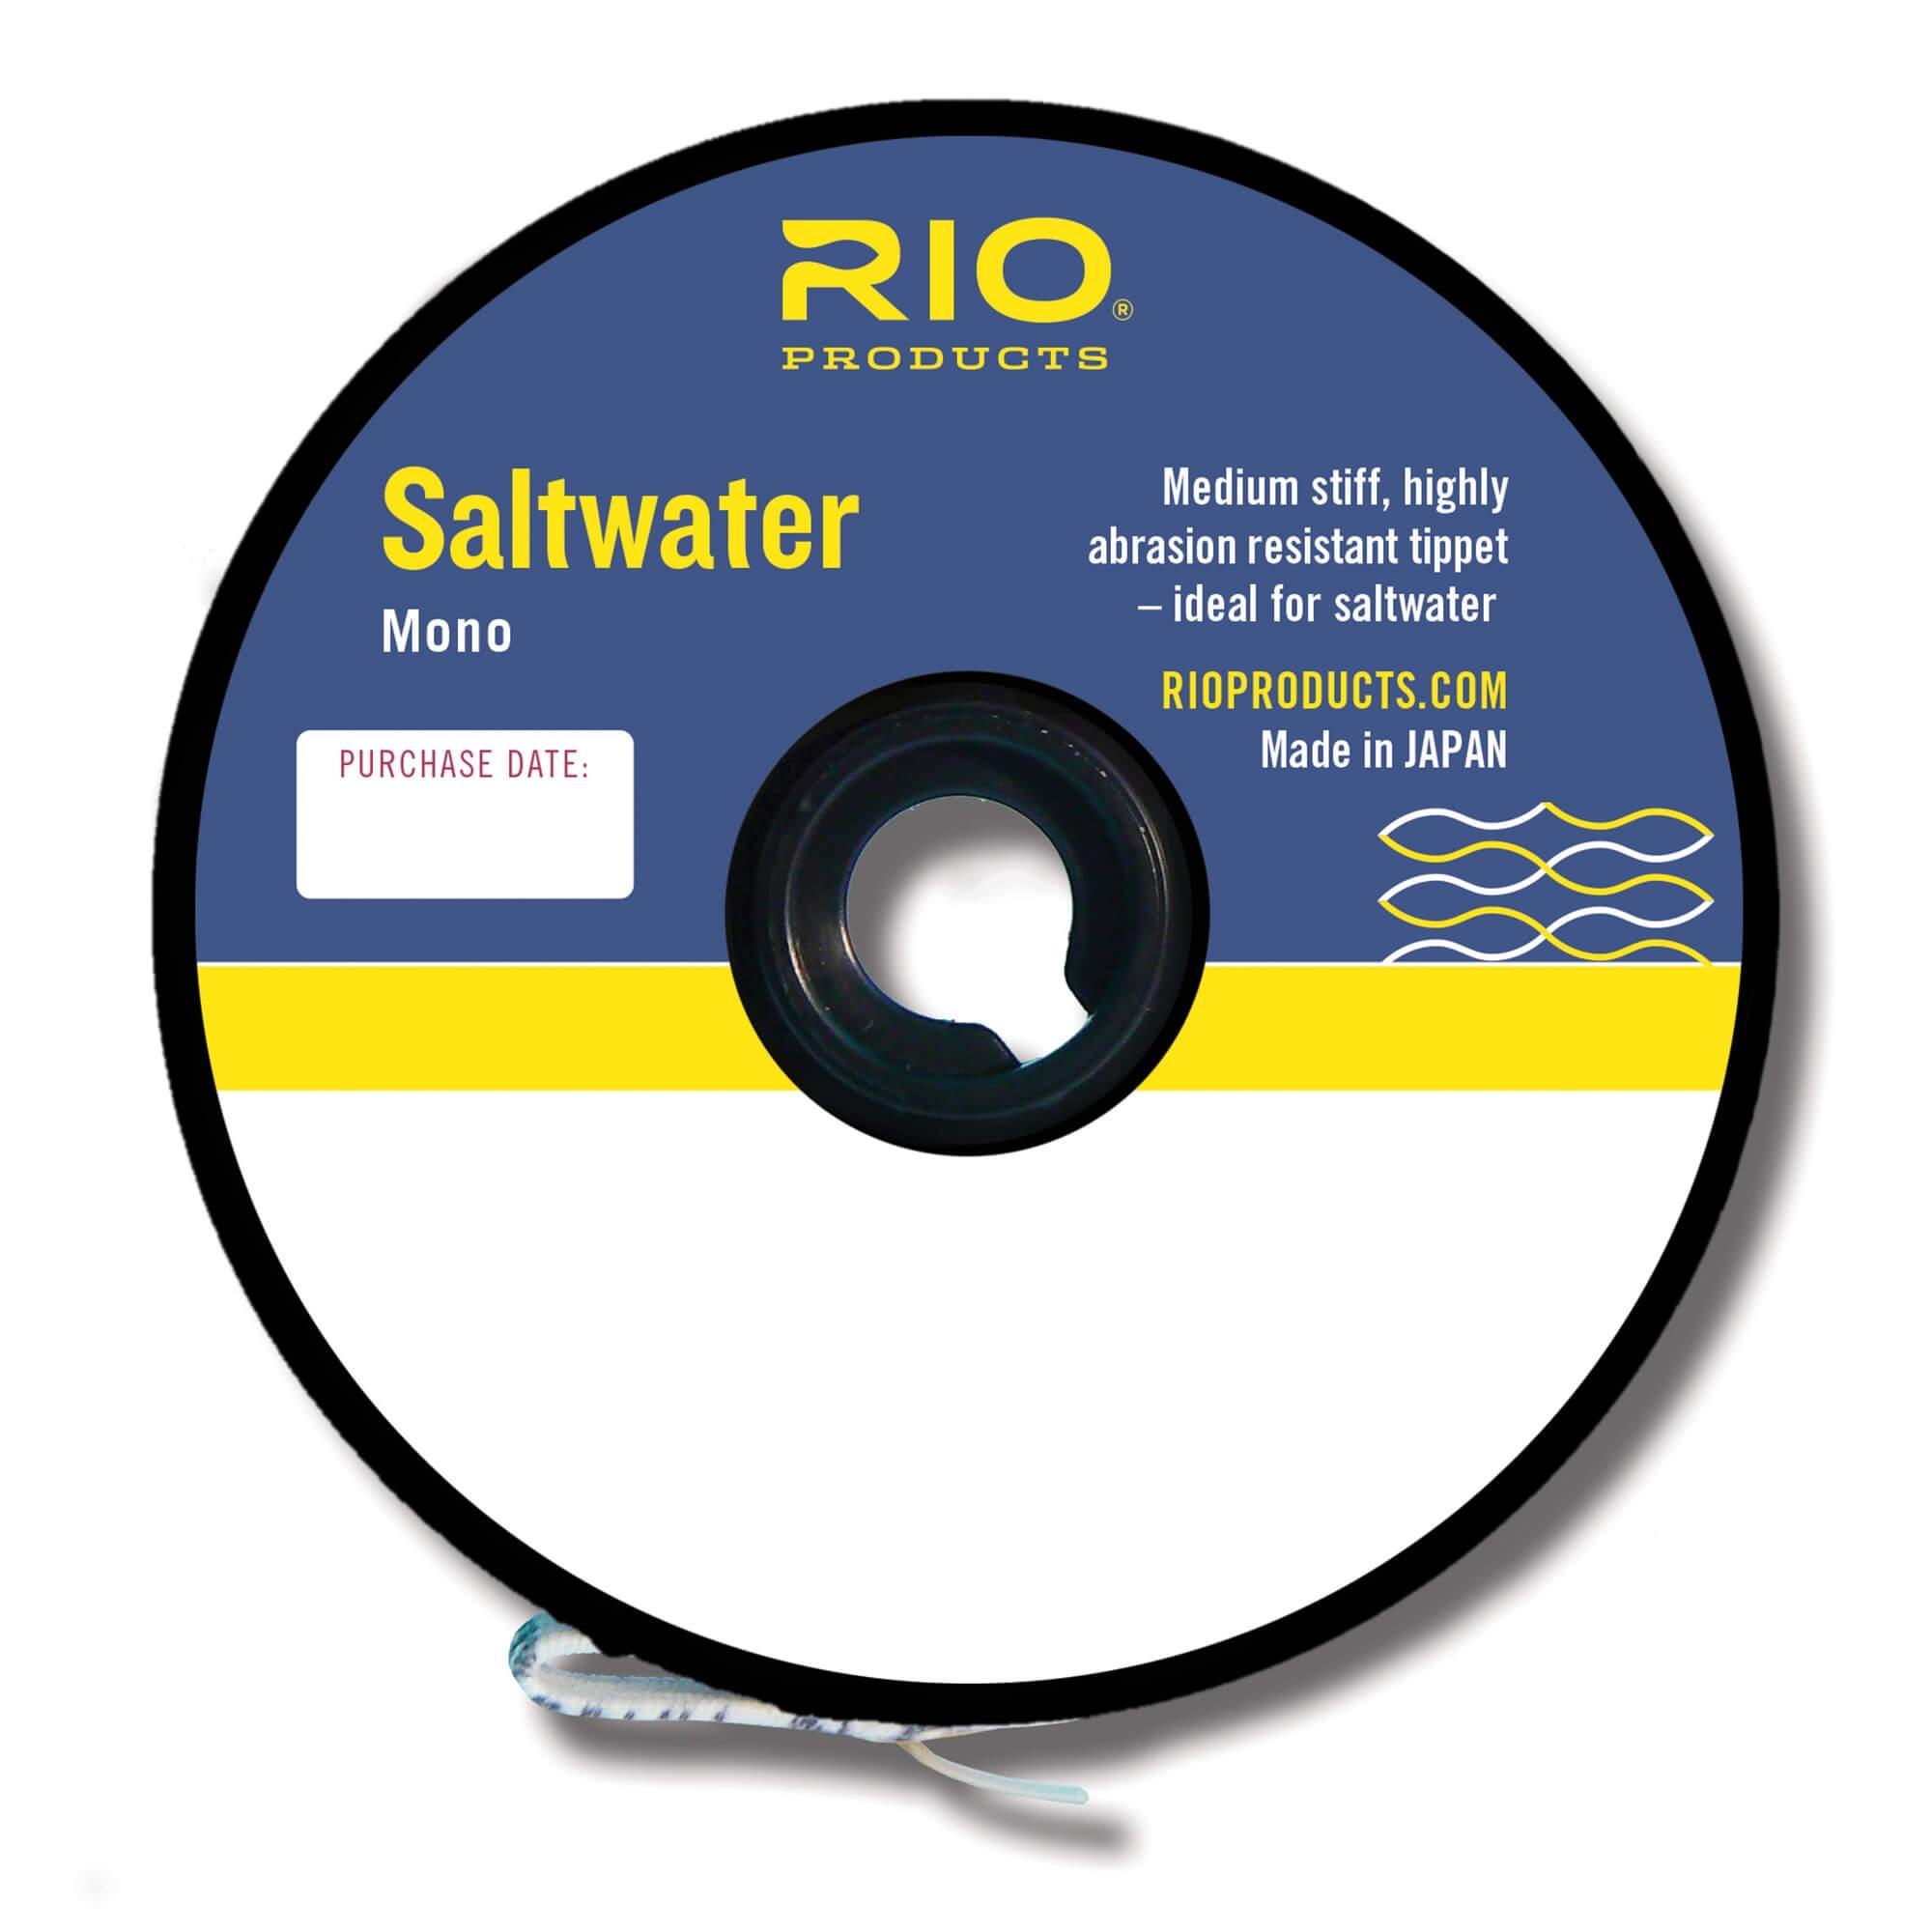 Saltwater Tippet Saltwater Mono